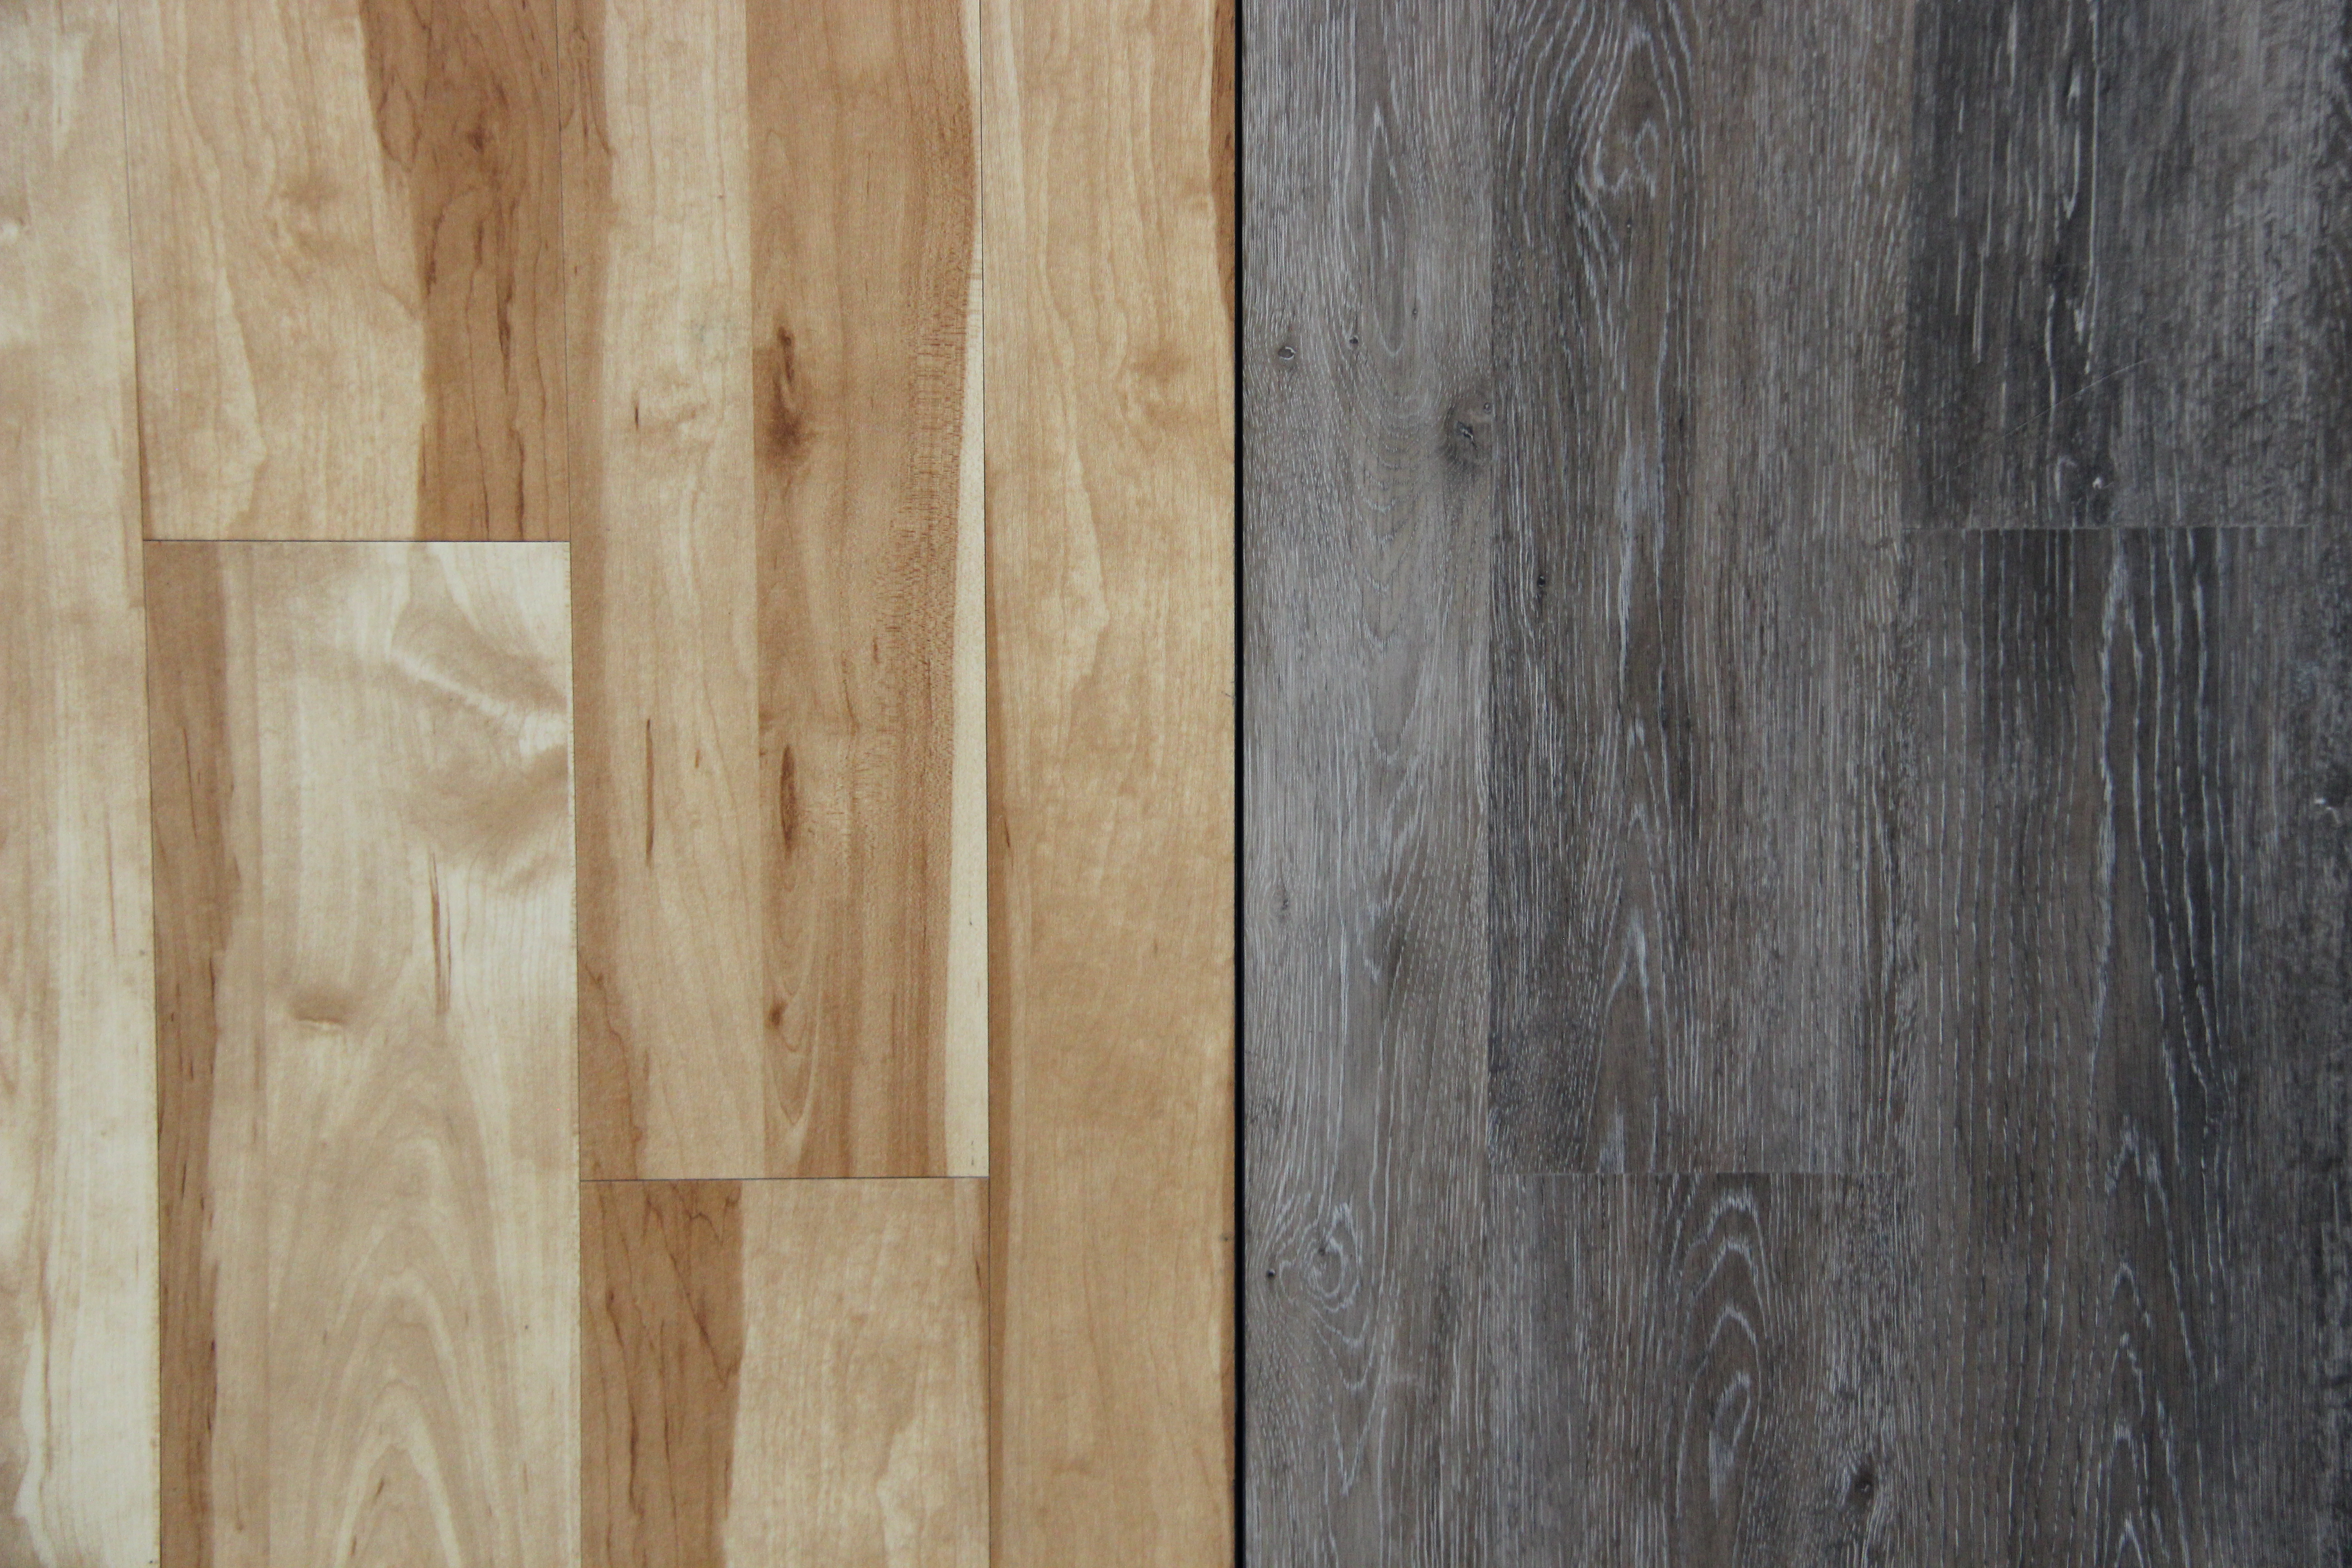 Interlocking vinyl plank flooring uk acai carpet sofa review vinyl click tile flooring img 6098 dailygadgetfo Image collections